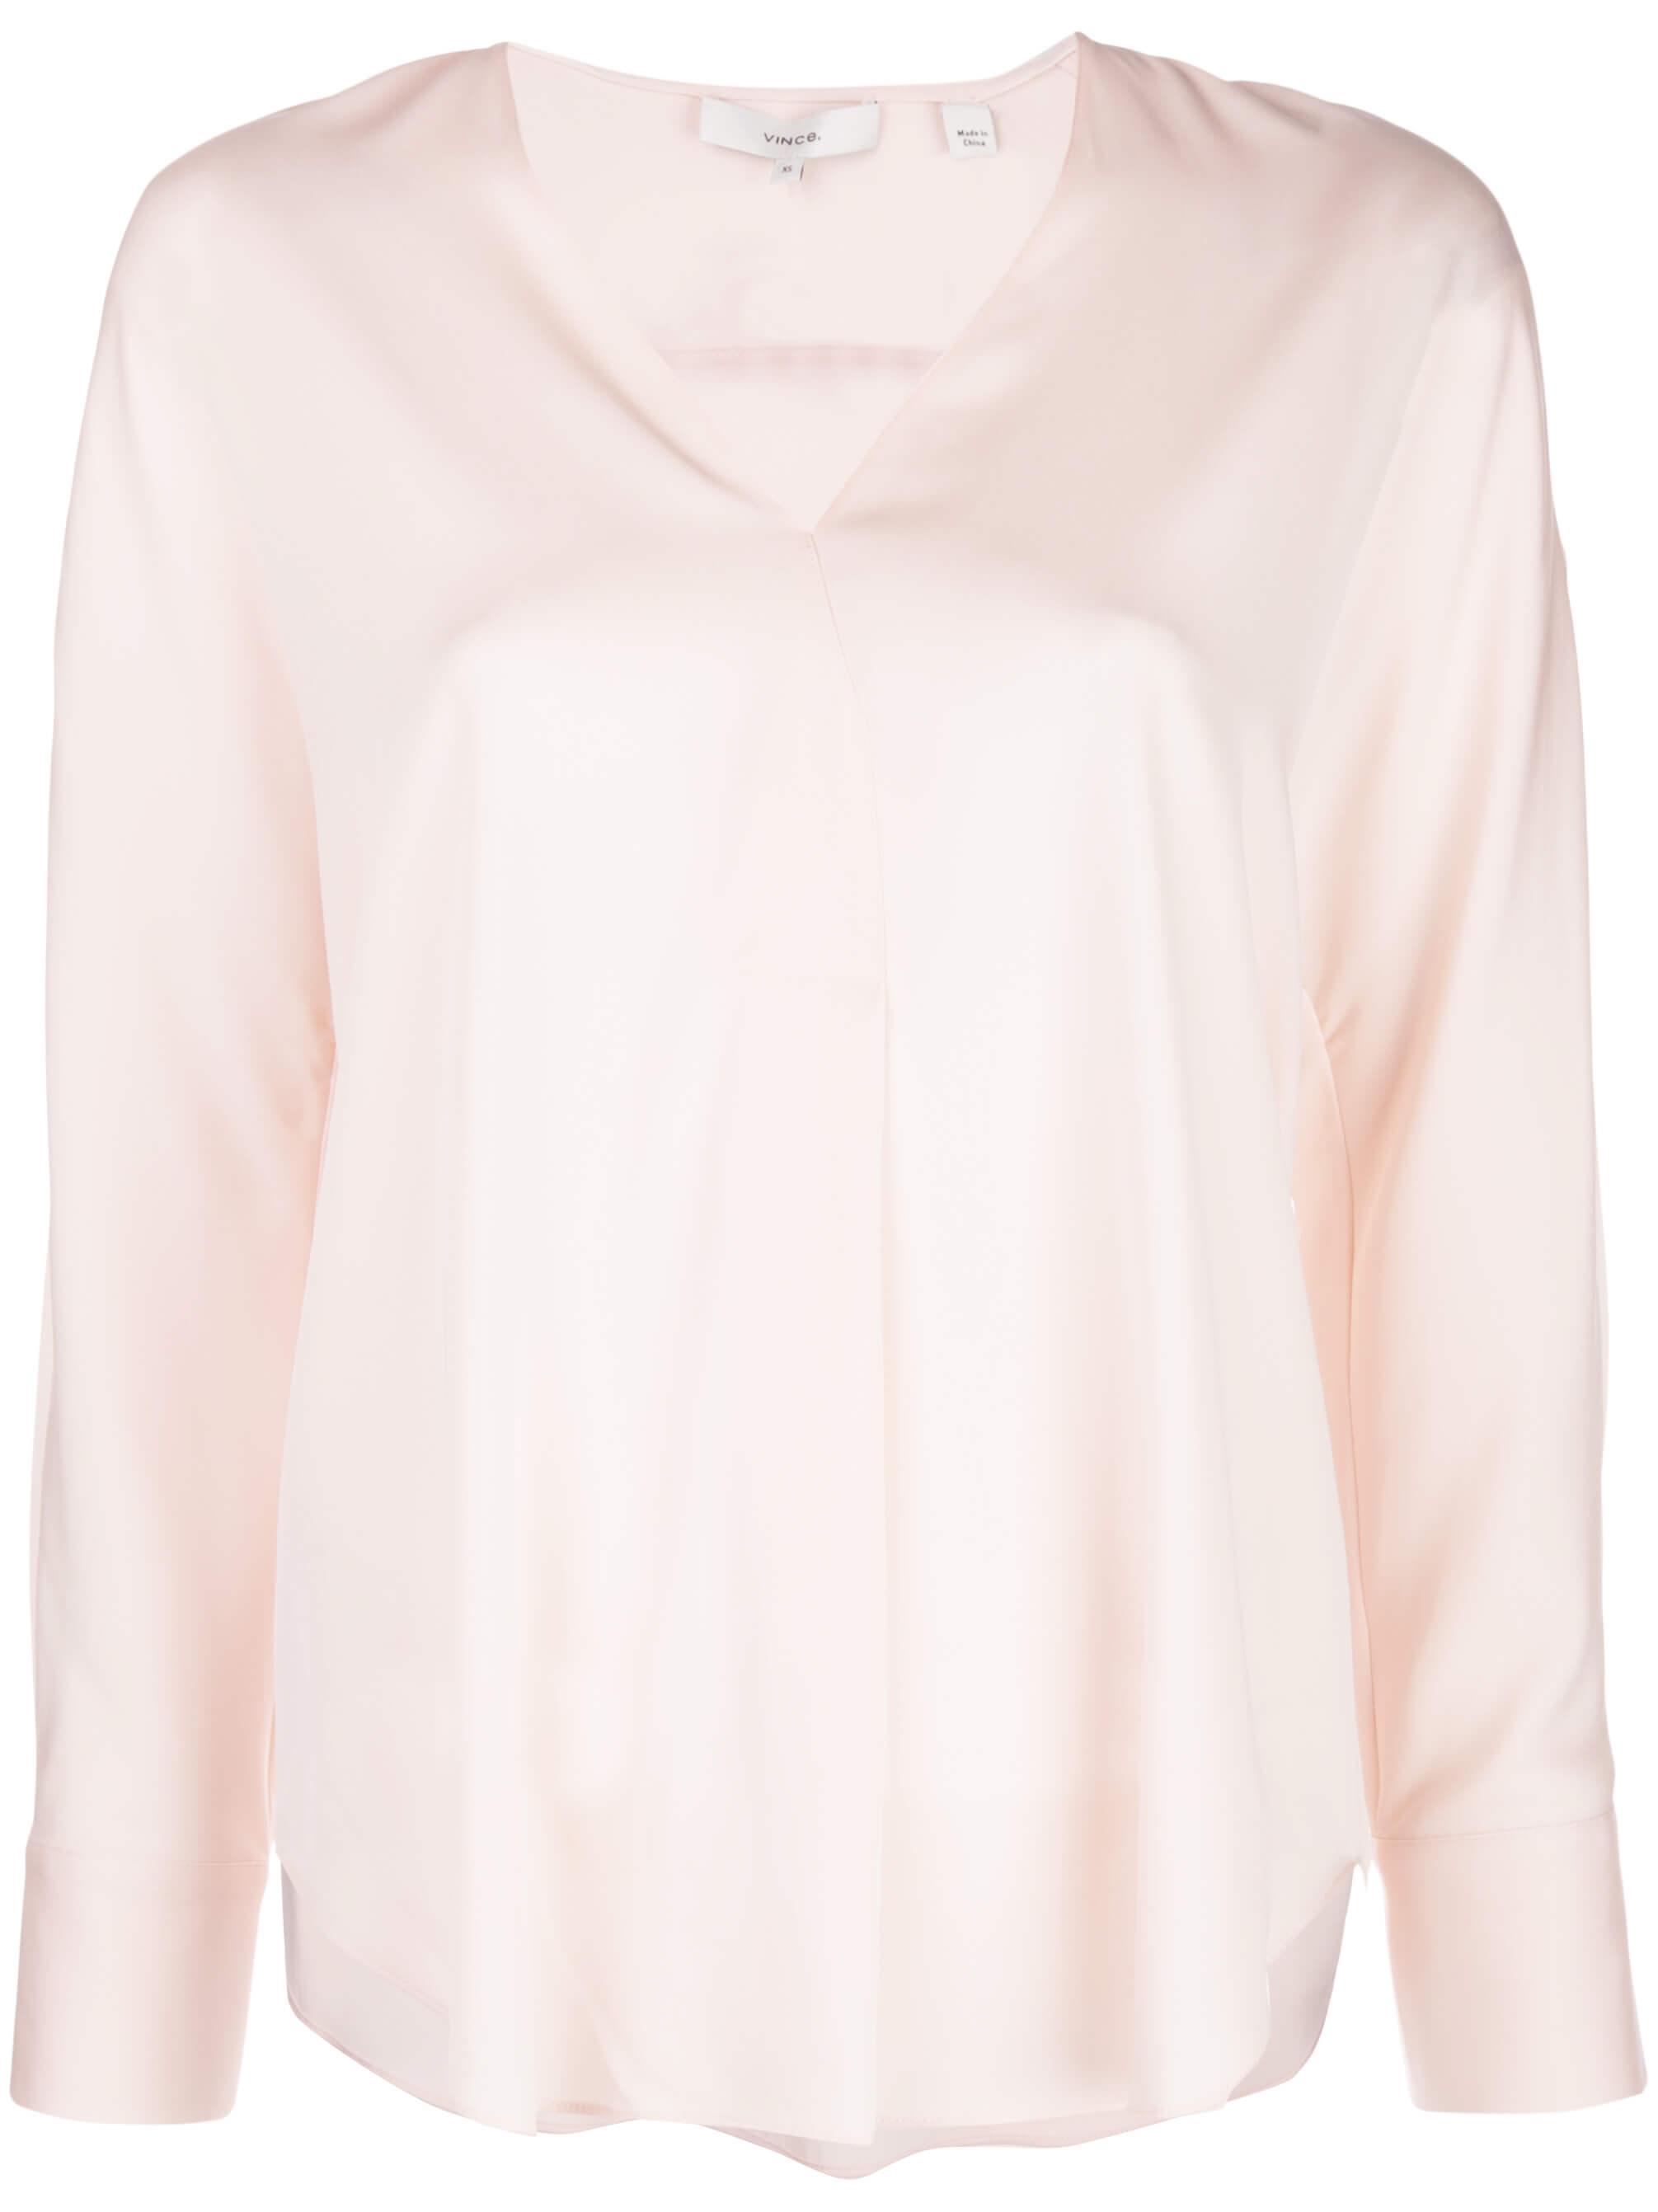 Long Sleeve V-Neck Popover Top